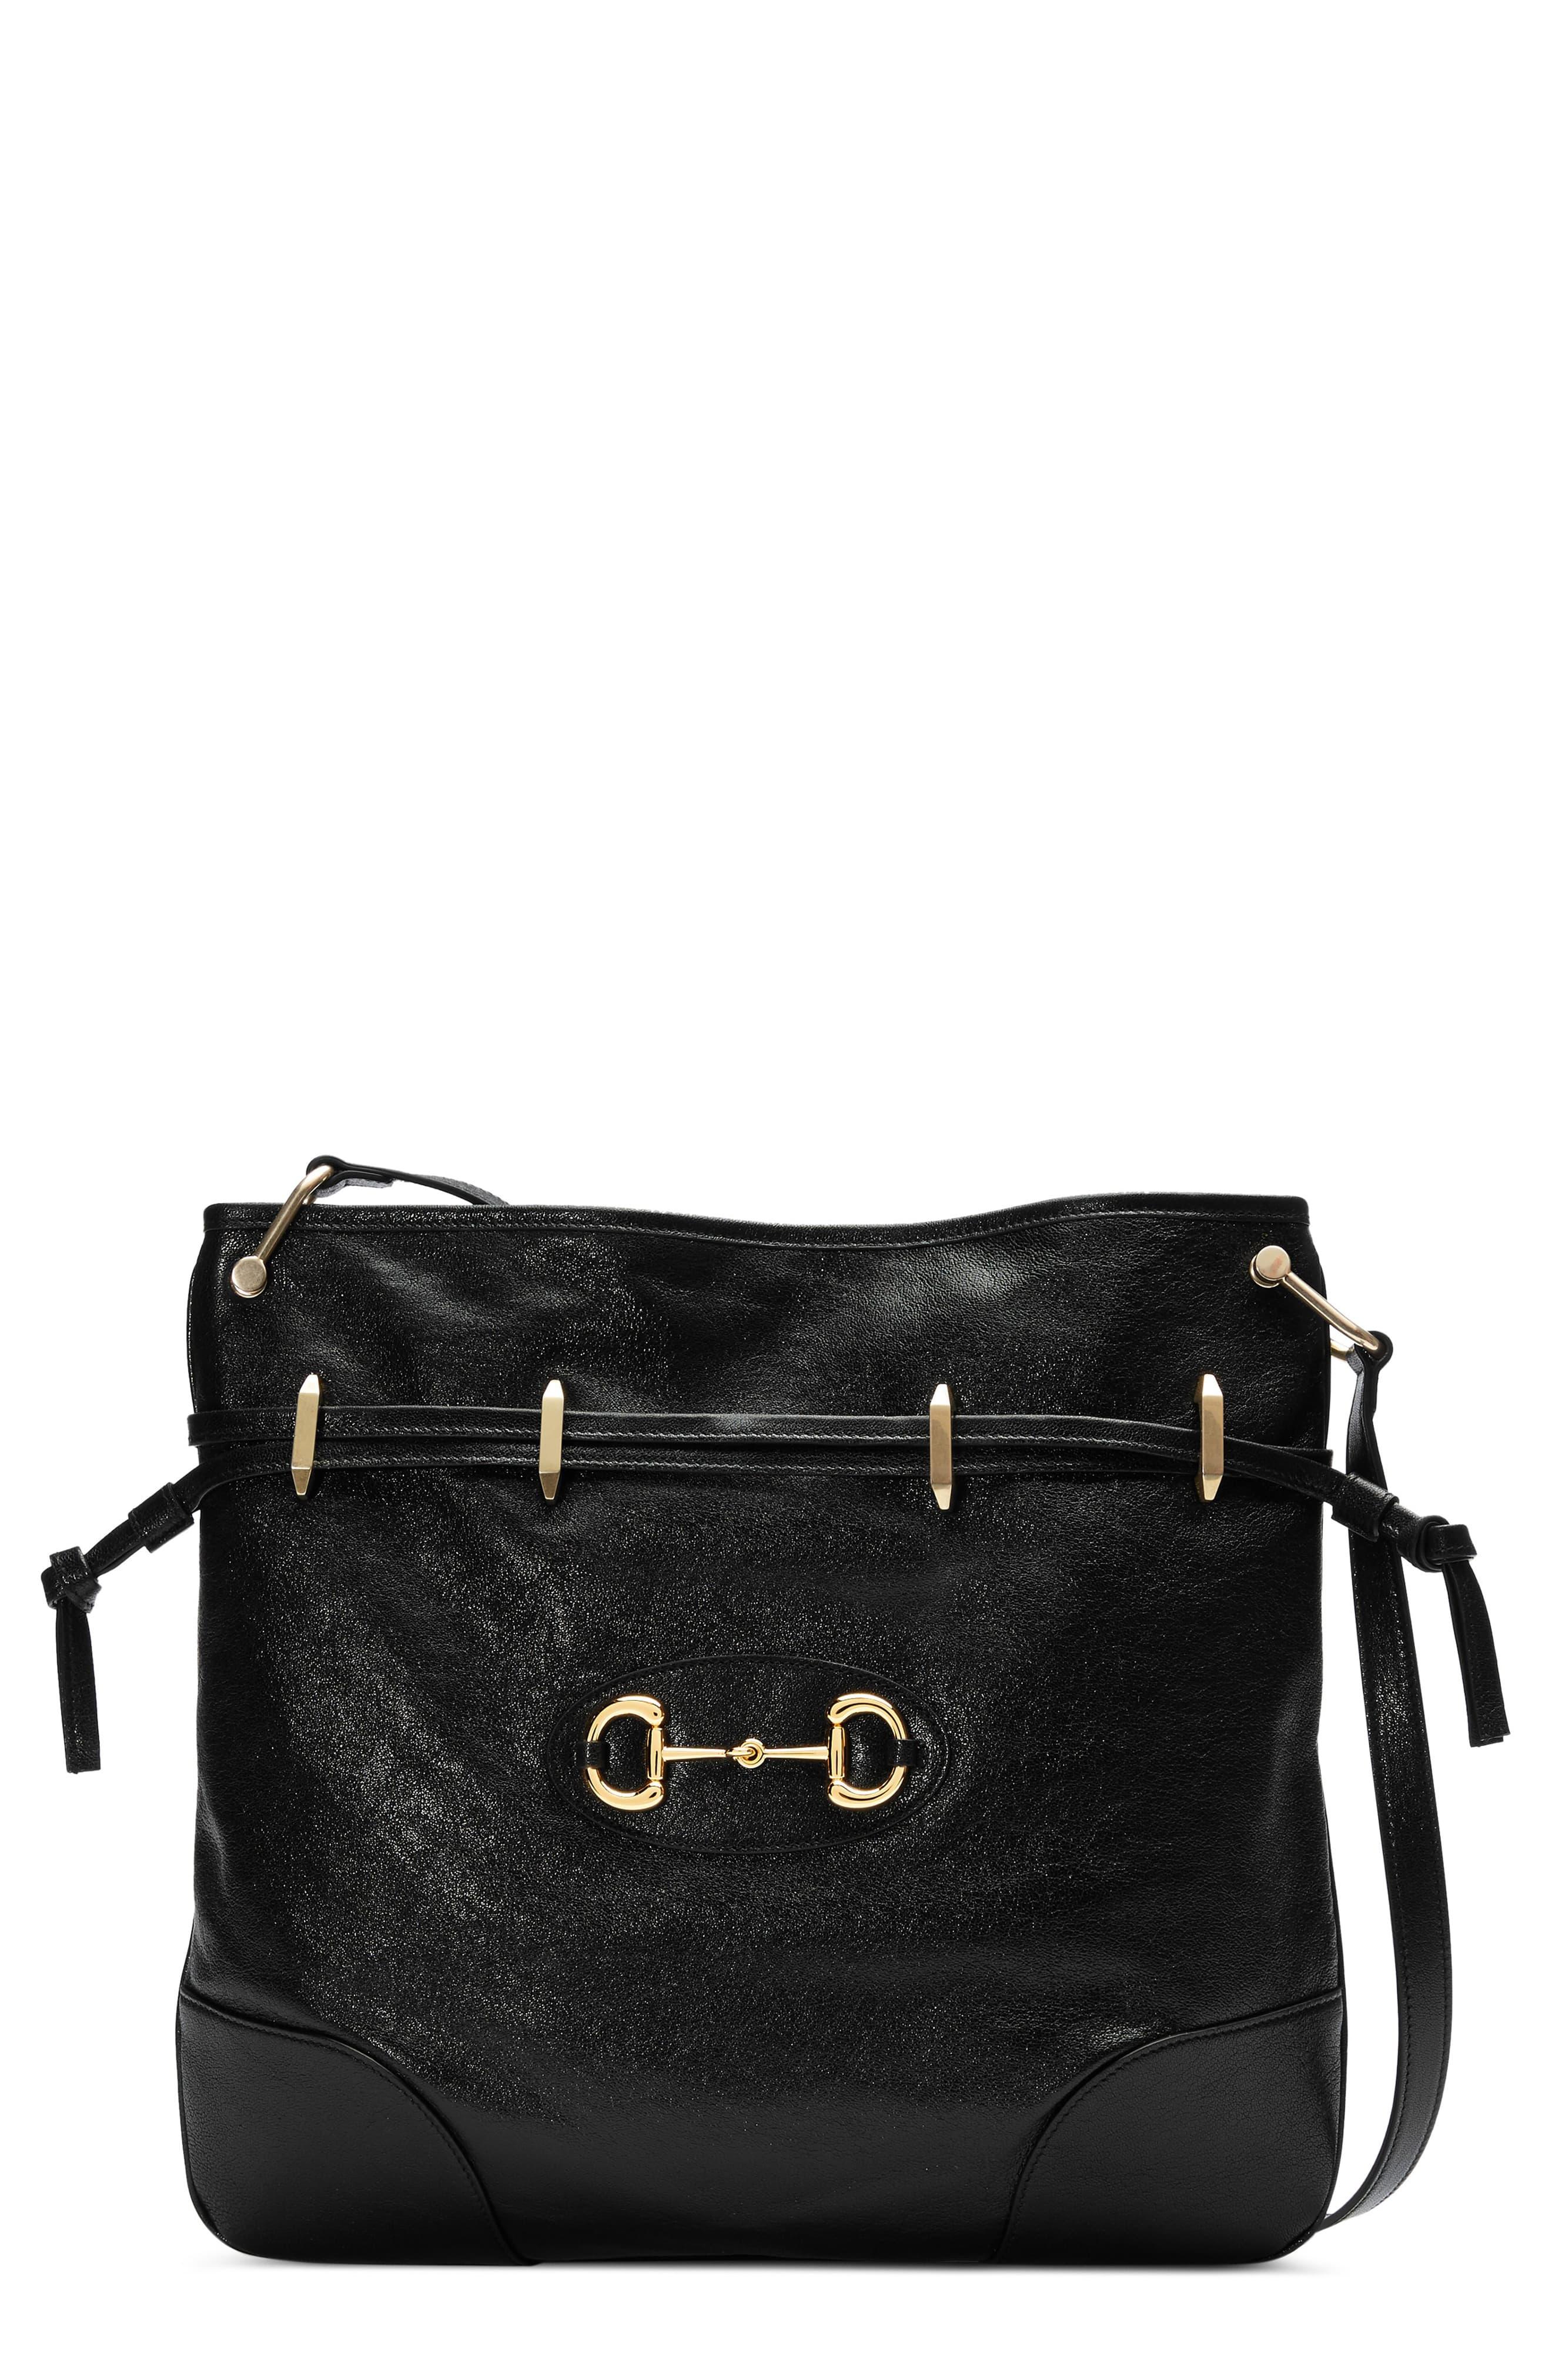 GUCCI Large 1955 Horsebit Leather Messenger Bag, Main, color, NERO